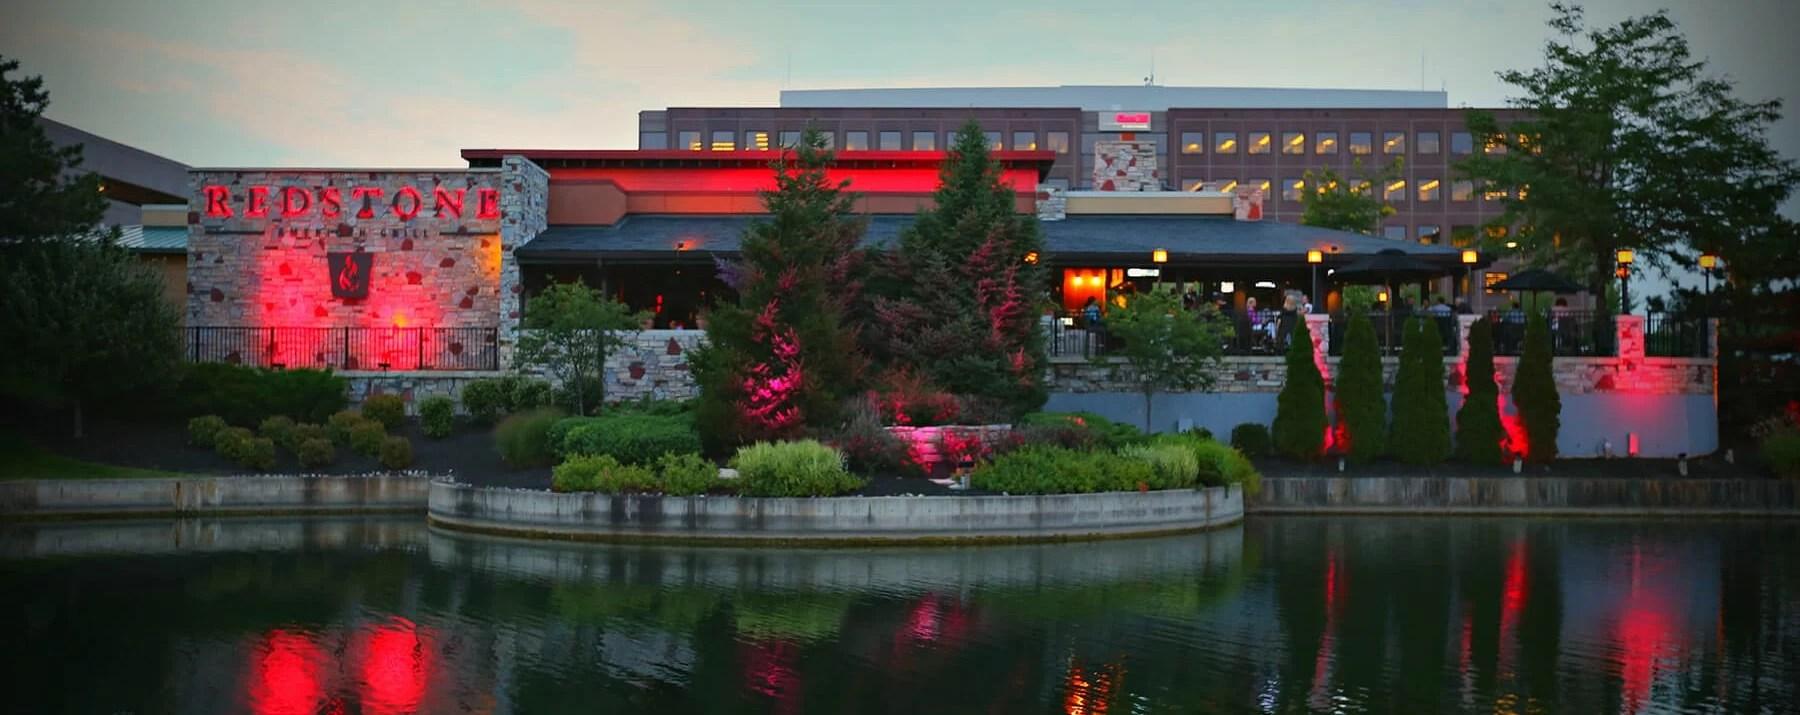 Oakbrook Terrace  Redstone Grill